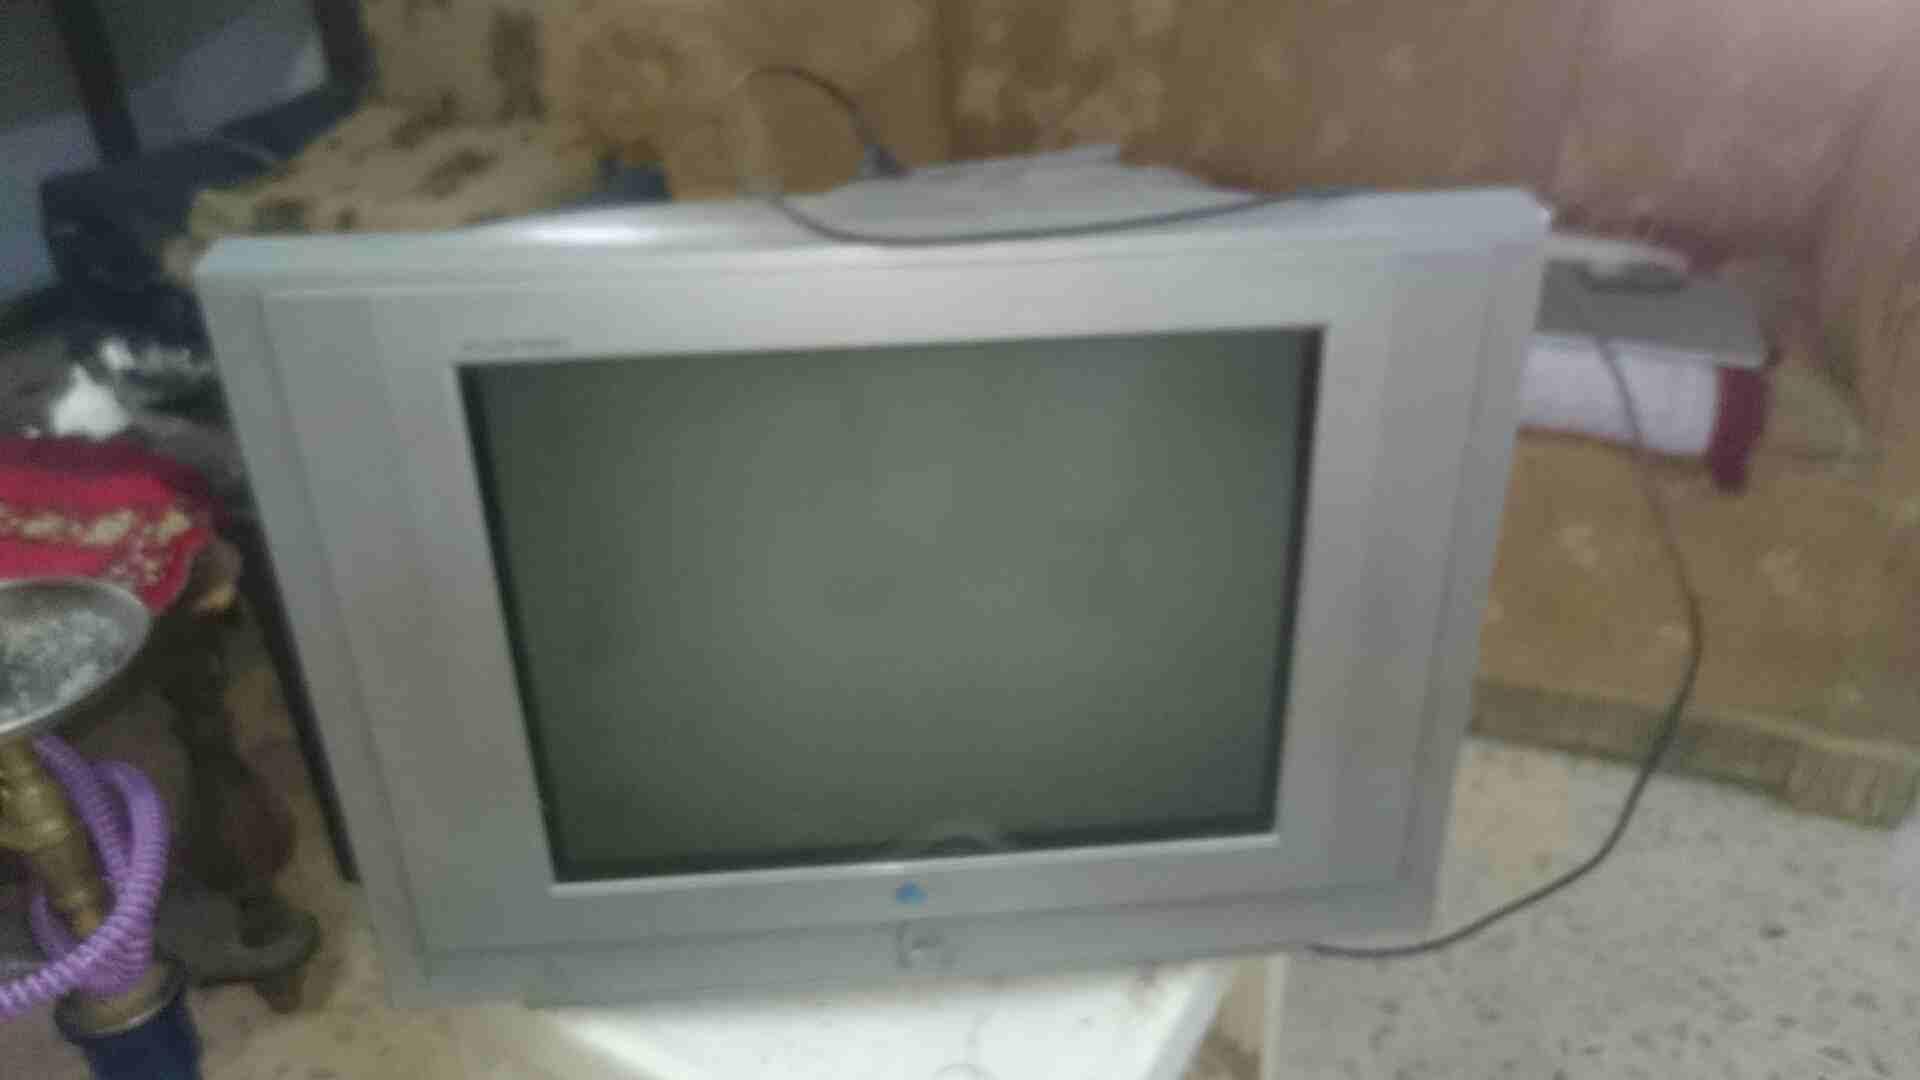 Tv for sale-  تلفزيونات للبيع لا تنسَ...